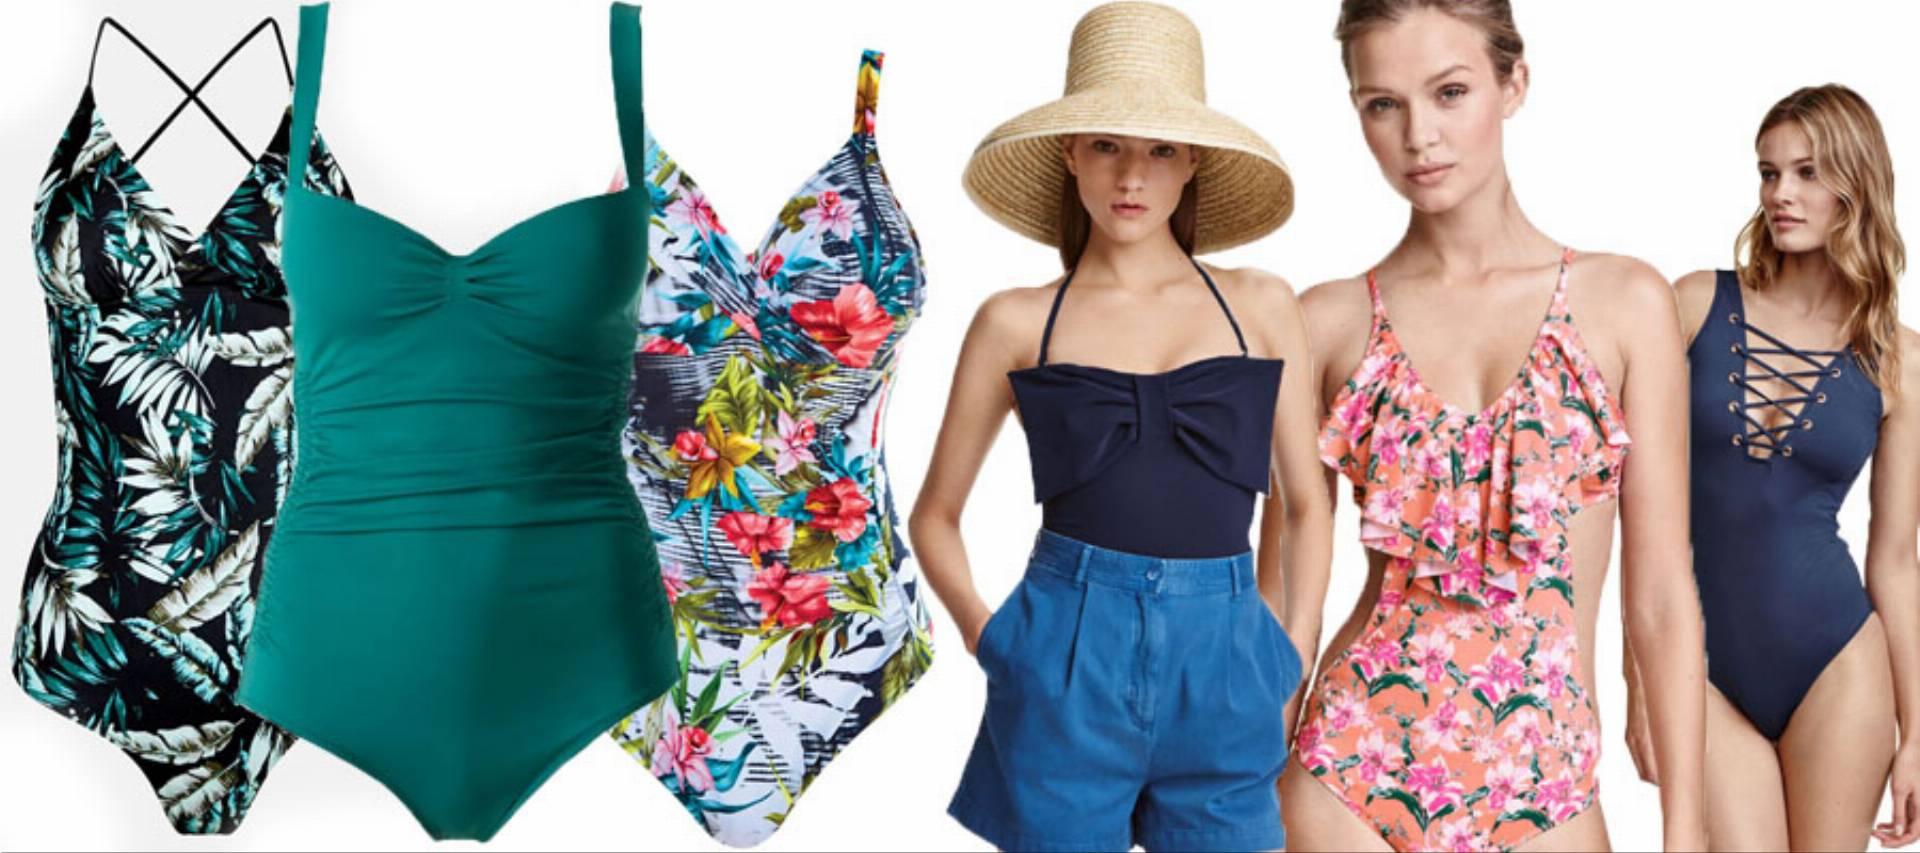 modne stroje jednoczęściowe na lato 2016